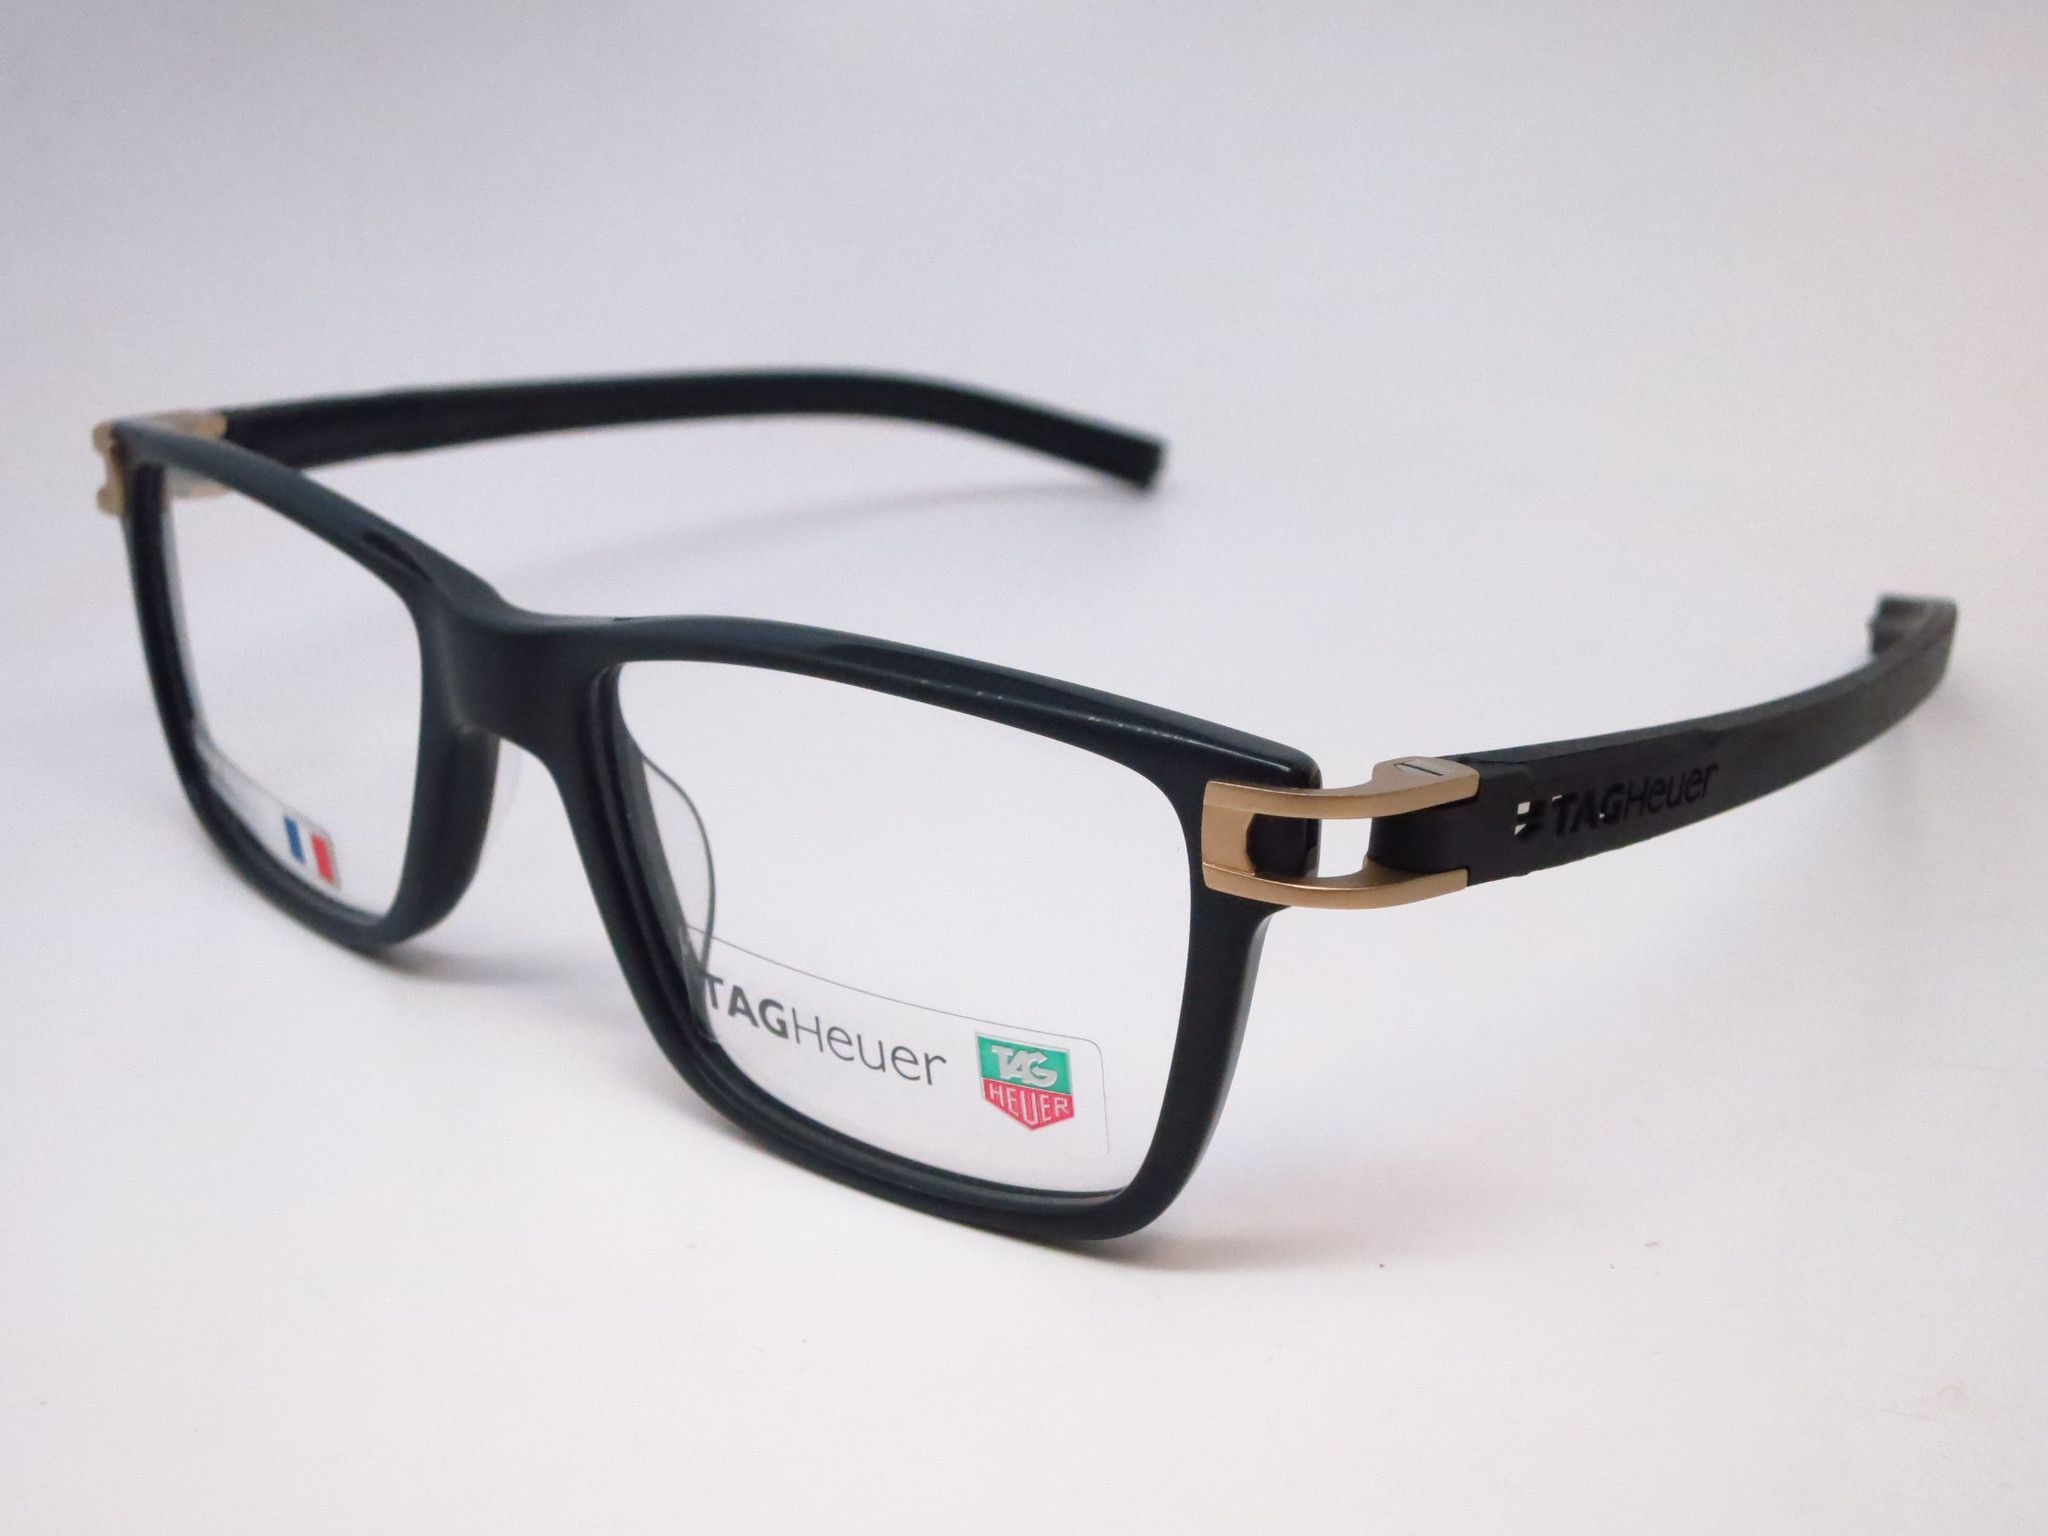 Tag Heuer TH 7603 008 Black Track-S Acetate Eyeglasses | Pinterest ...